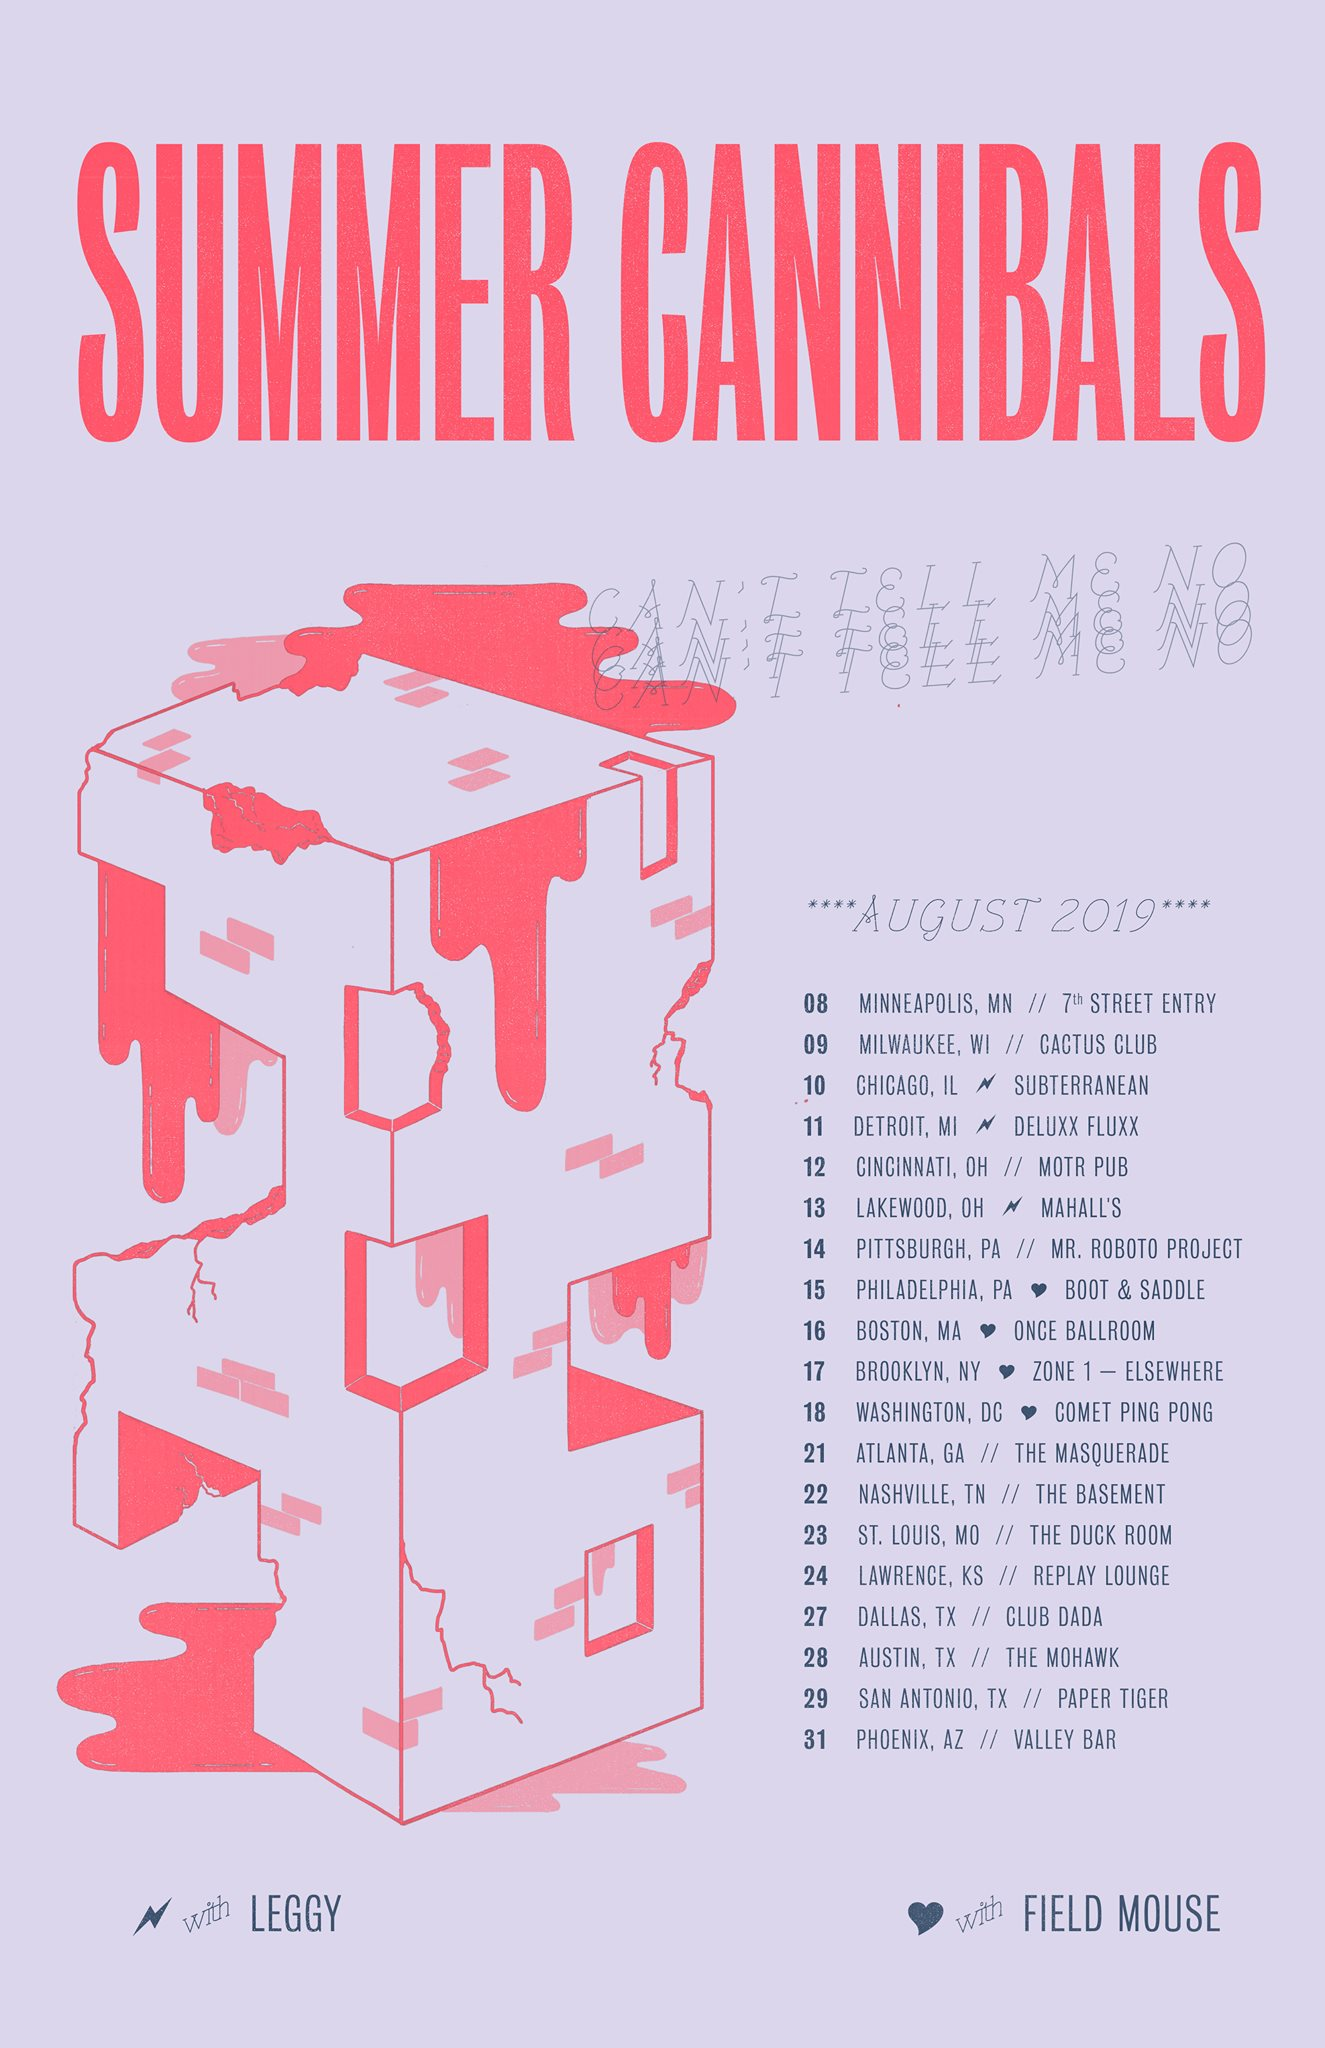 Summer Cannibals - Venue: The BasementCity: Nashville, TNDate: August 22, 2019